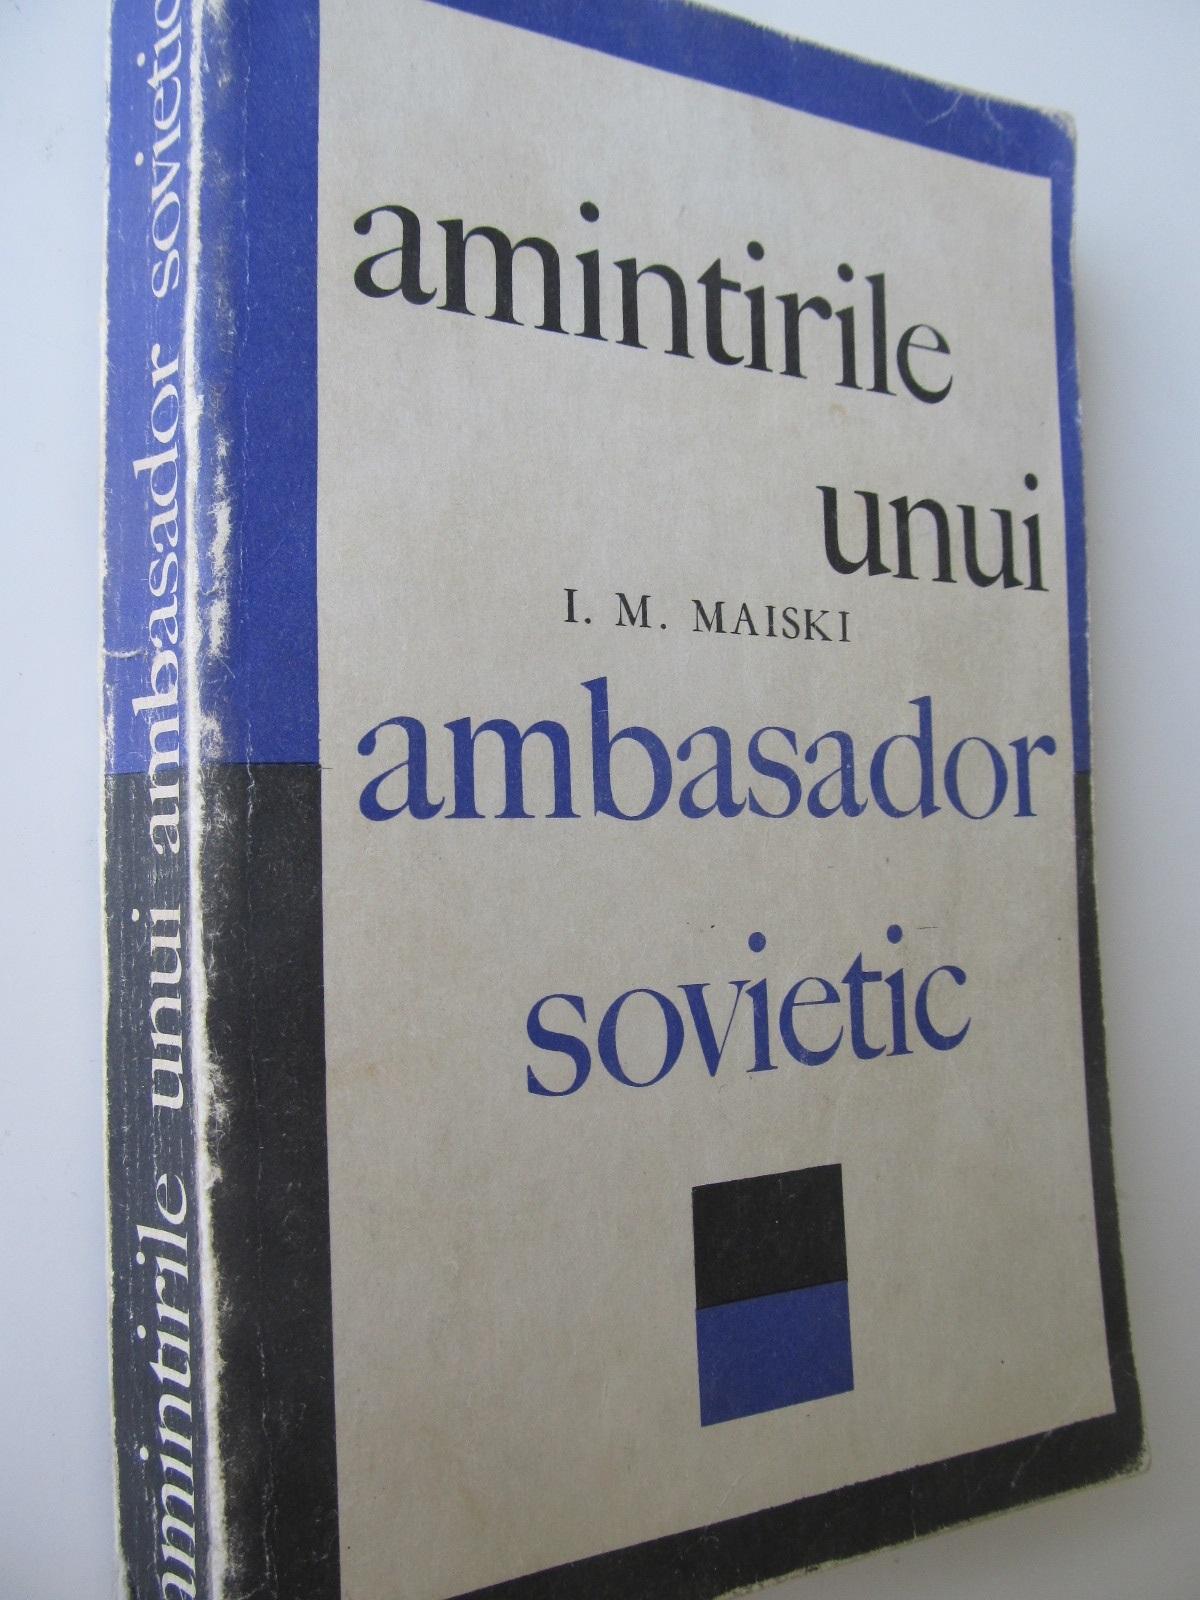 Amintirile unui ambasador spvietic - I. M. Maiski | Detalii carte